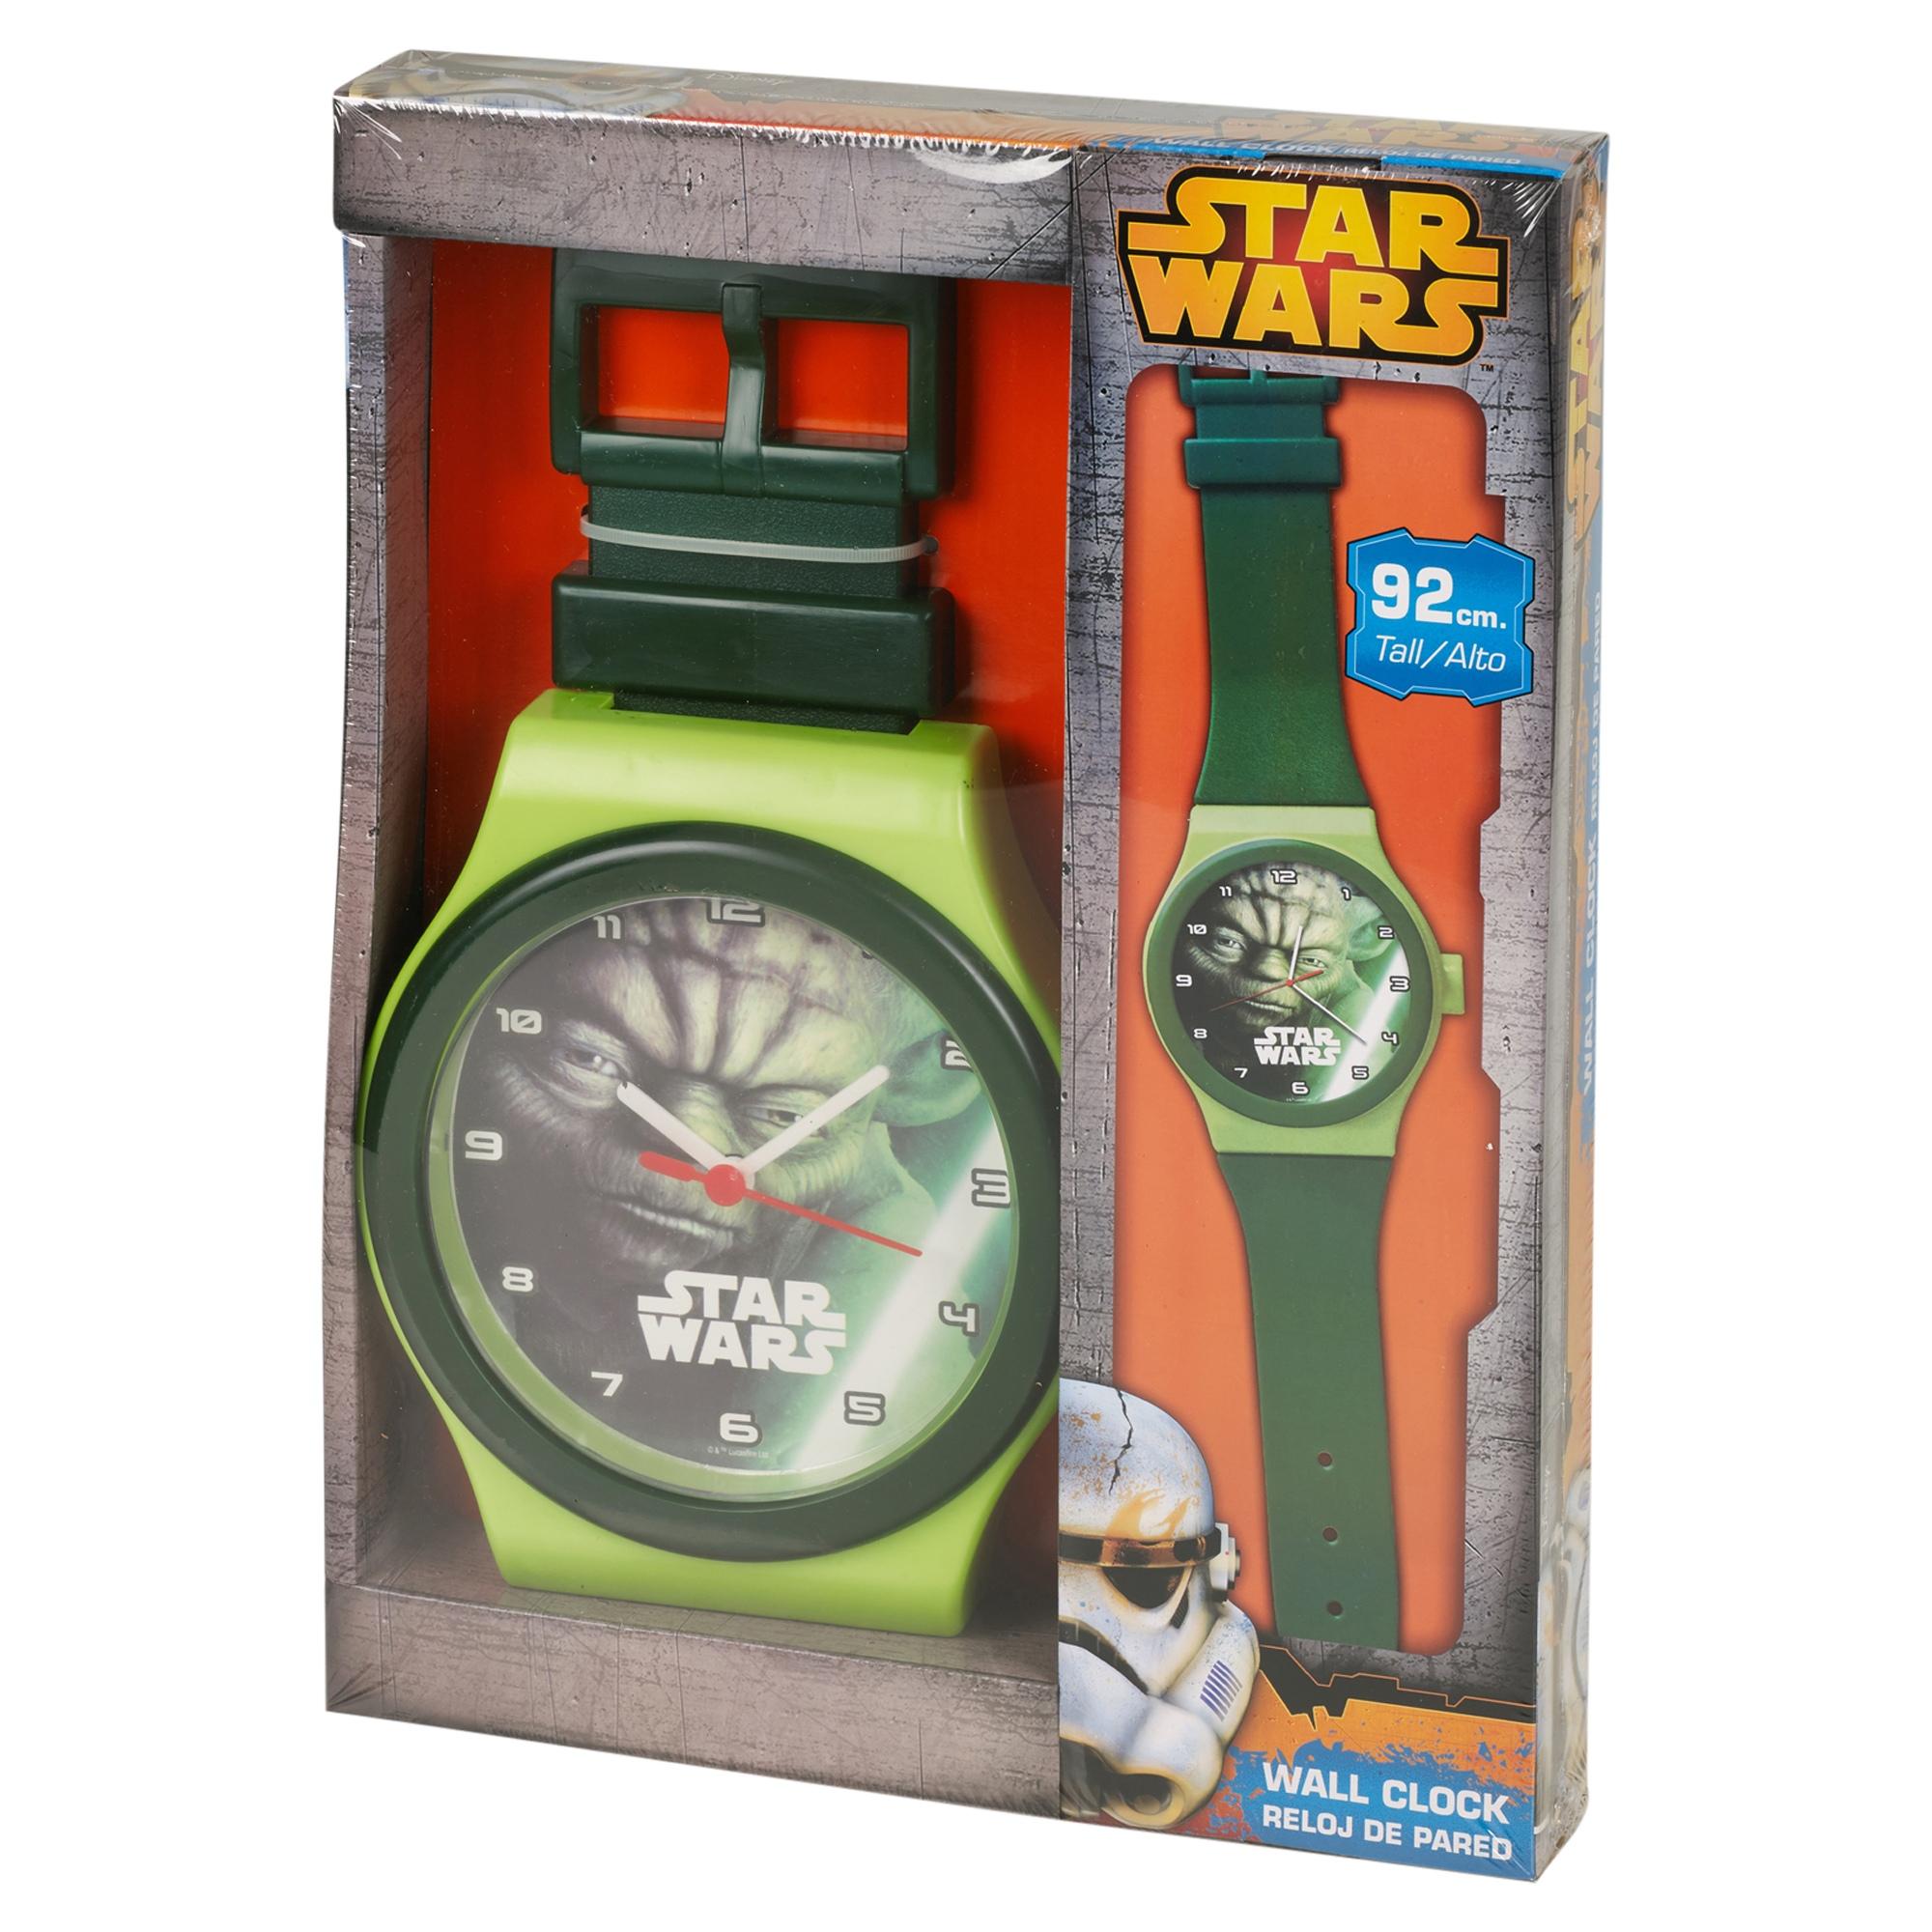 Large 92cm Wrist Watch Style Disney Wall Clock Childrens